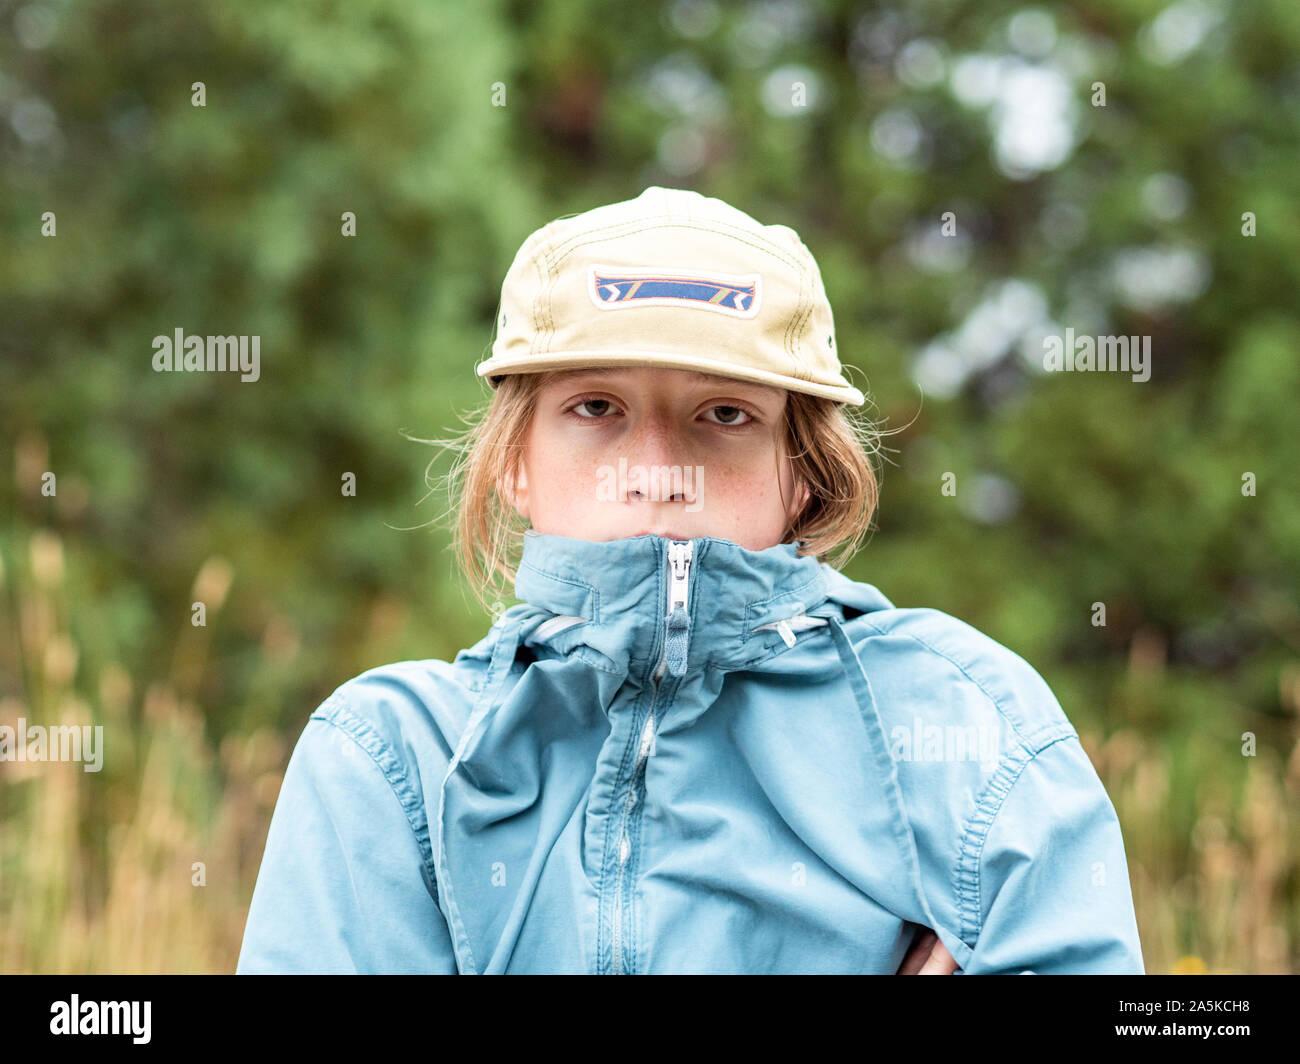 Portrait of teenage boy with wind breaker et hat outdoors Banque D'Images